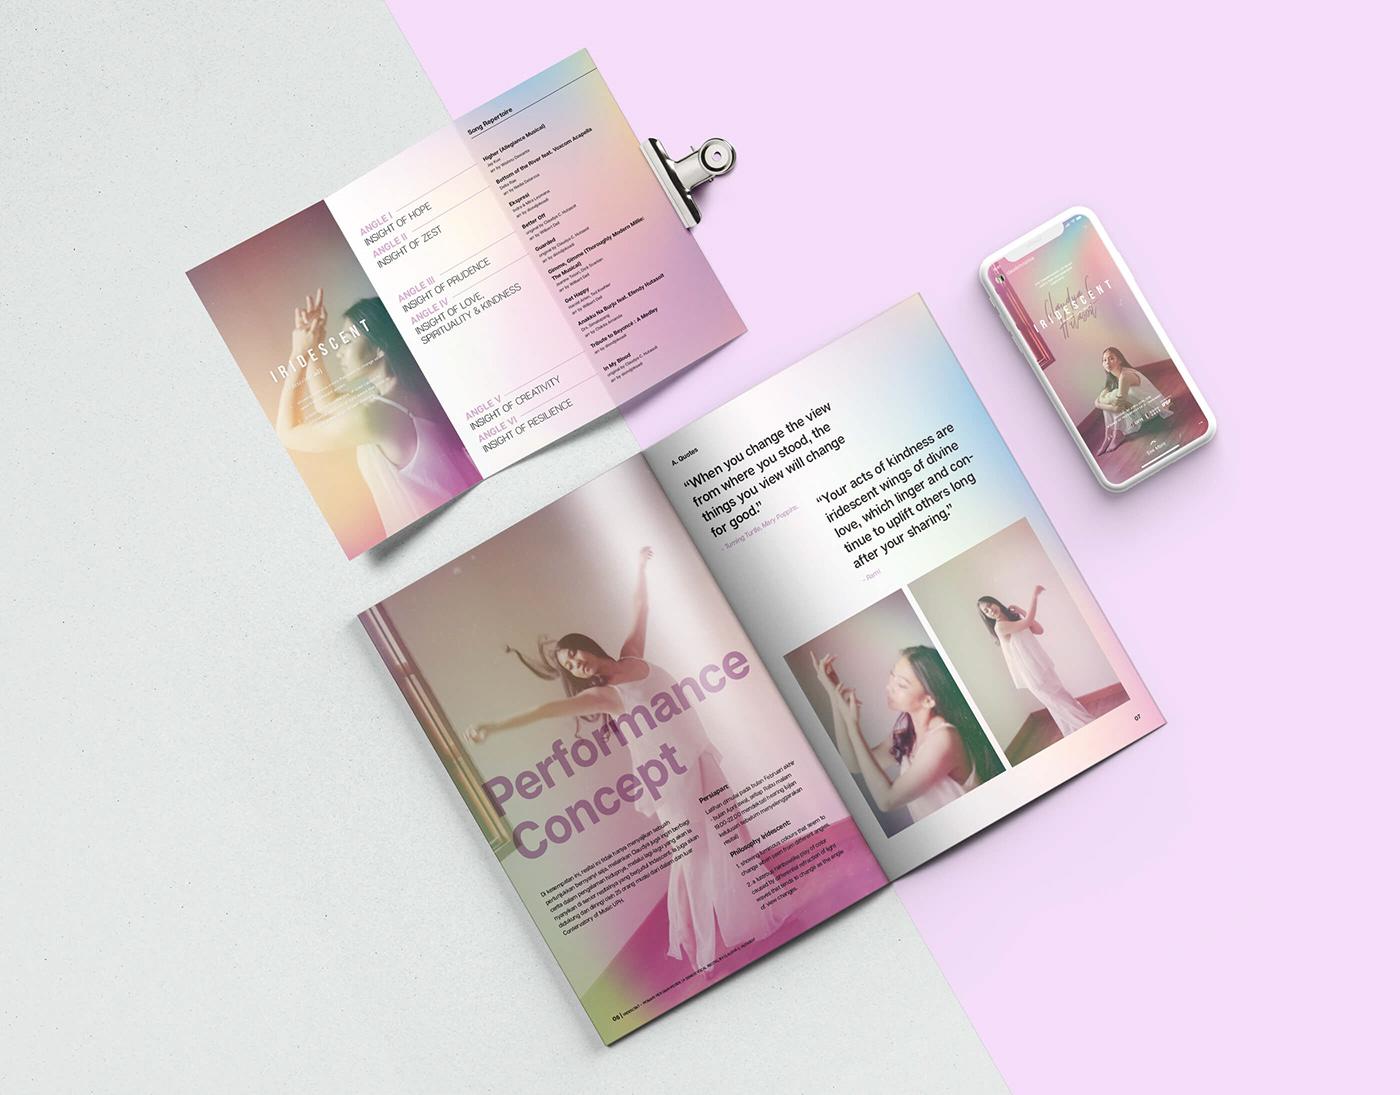 Event Branding recital music Singing Stationery Photography  feminime iridescent purple bright